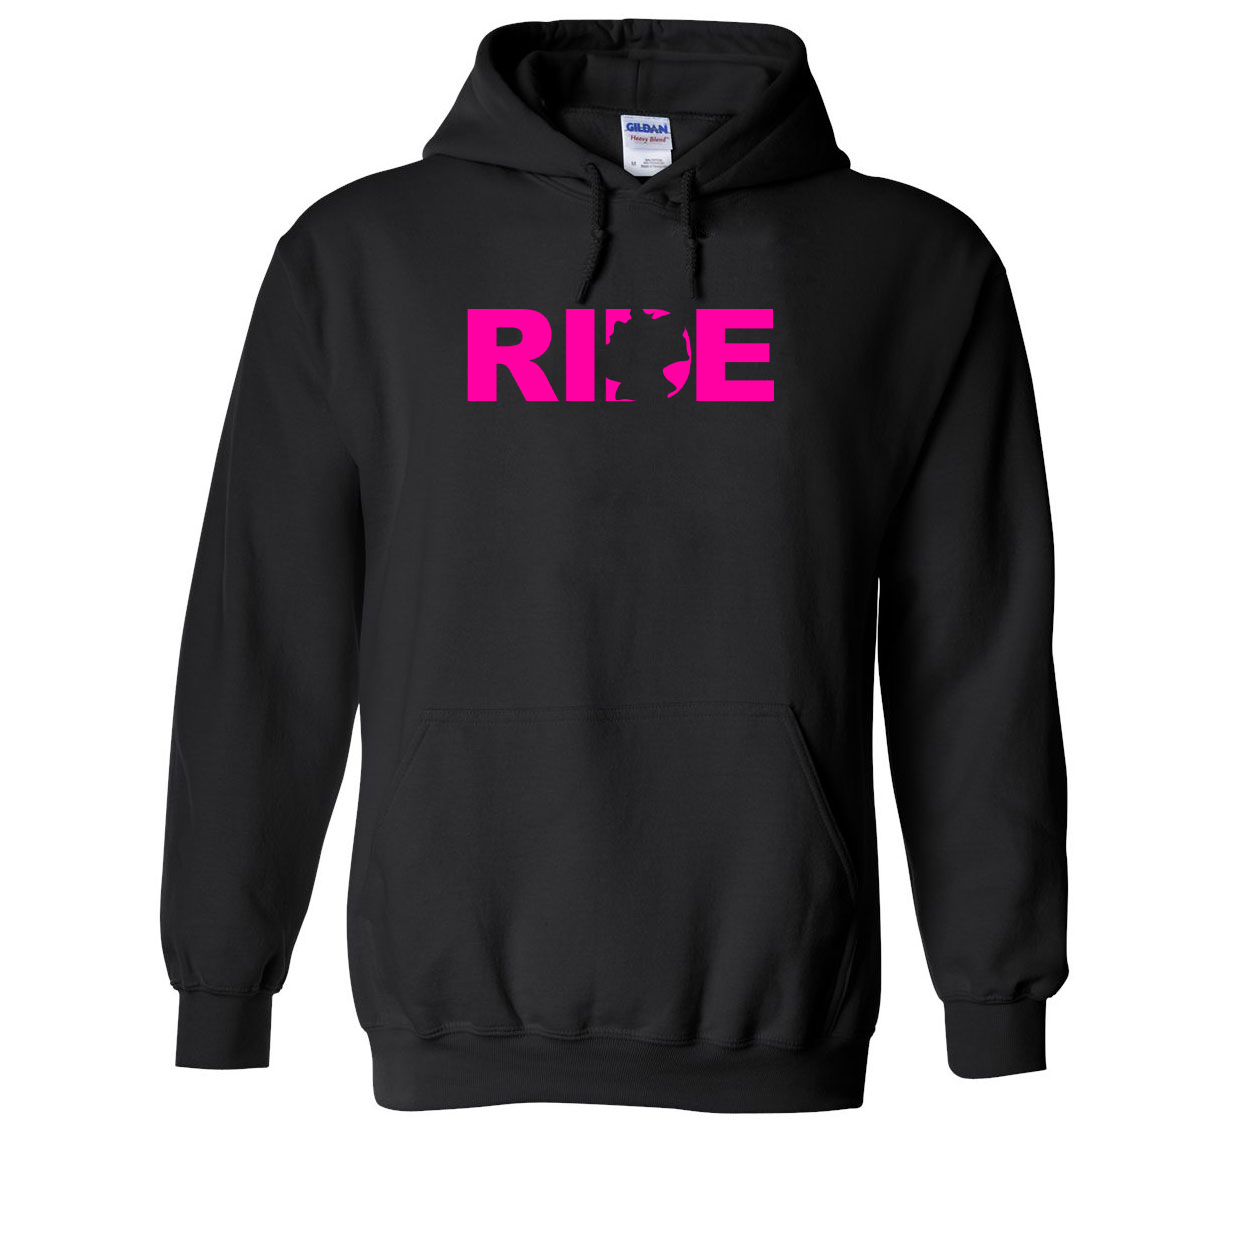 Ride Germany Classic Sweatshirt Black (Pink Logo)